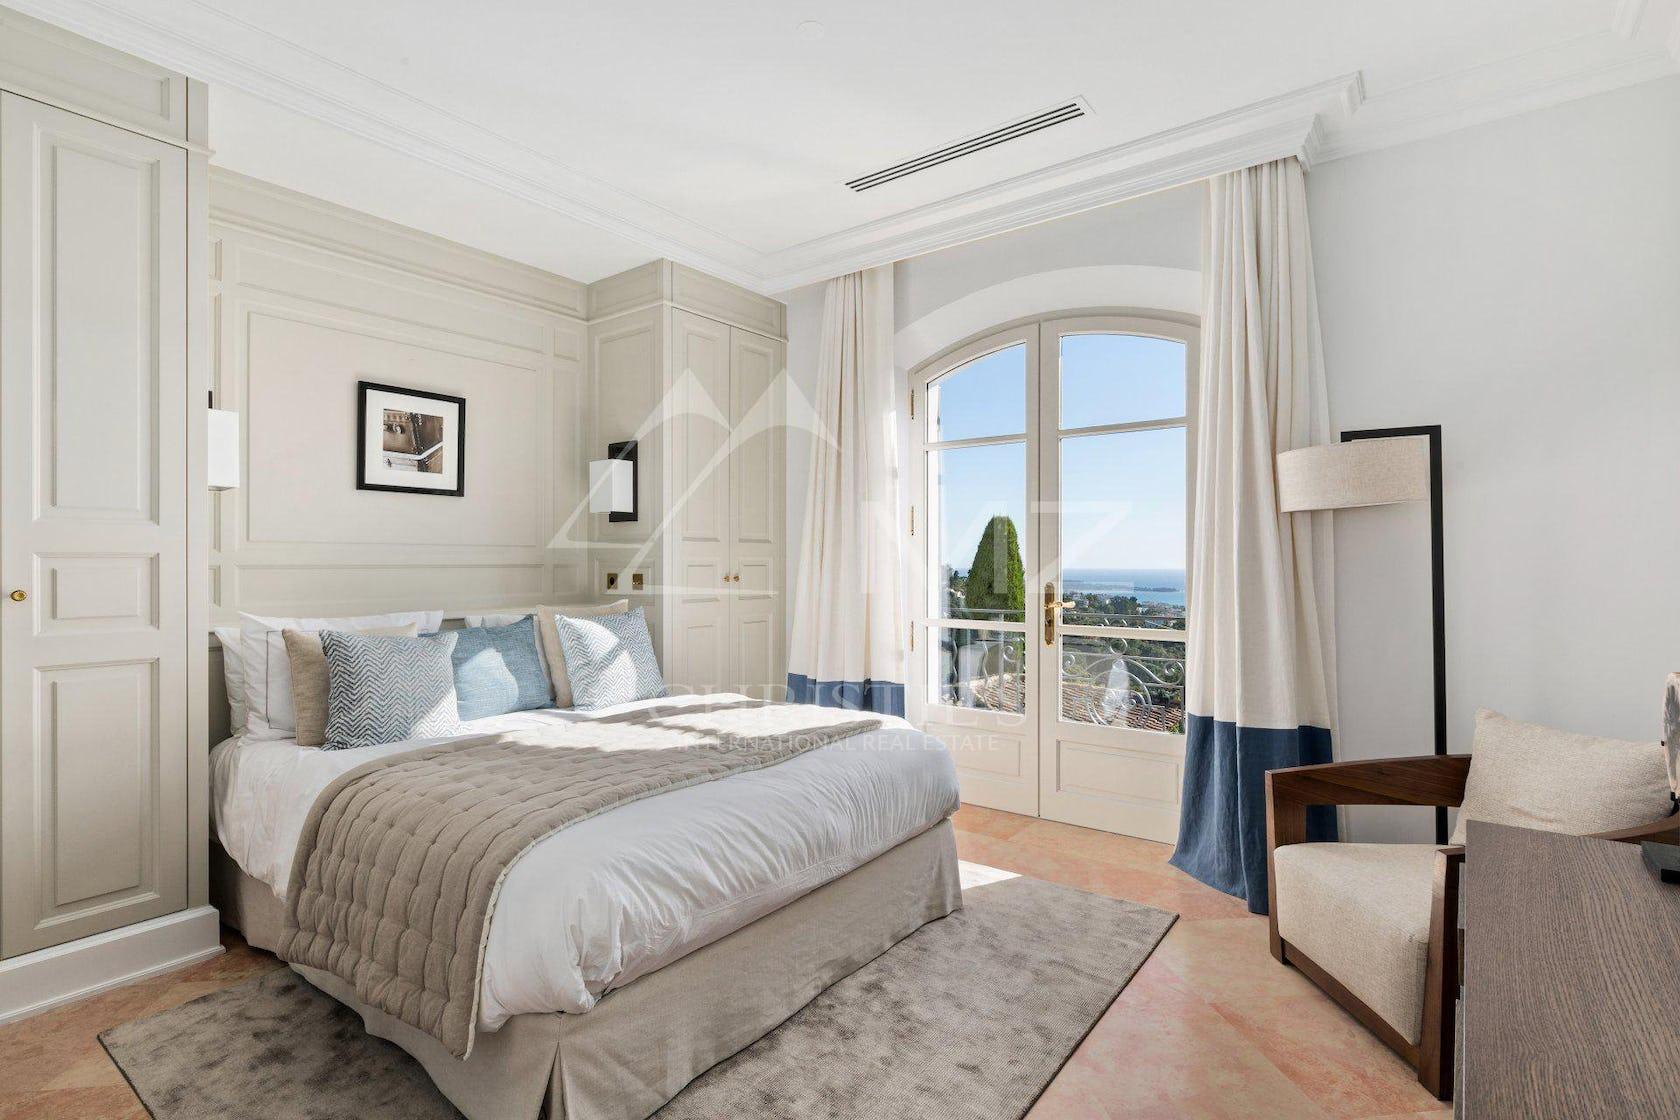 bedroom room indoors furniture bed interior design